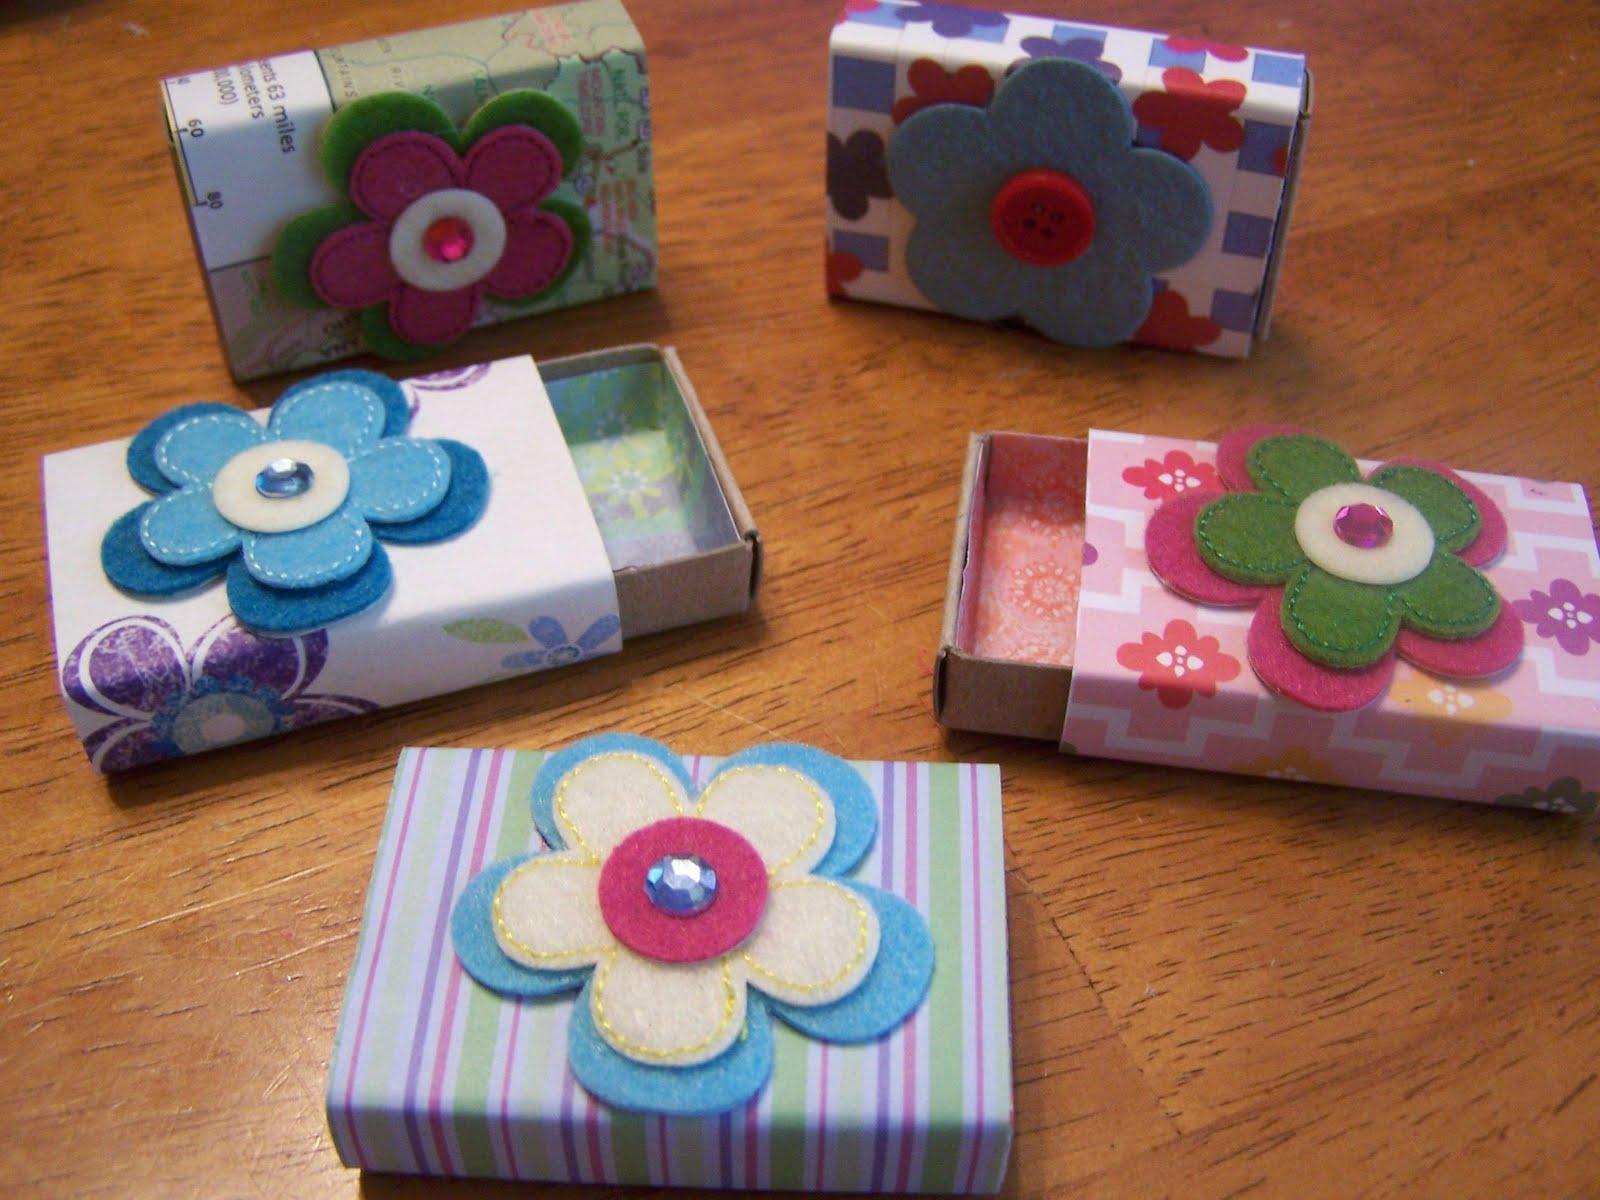 Actividades escolares como hacer alhajeros con reciclaje for Personalized crafts to make and sell